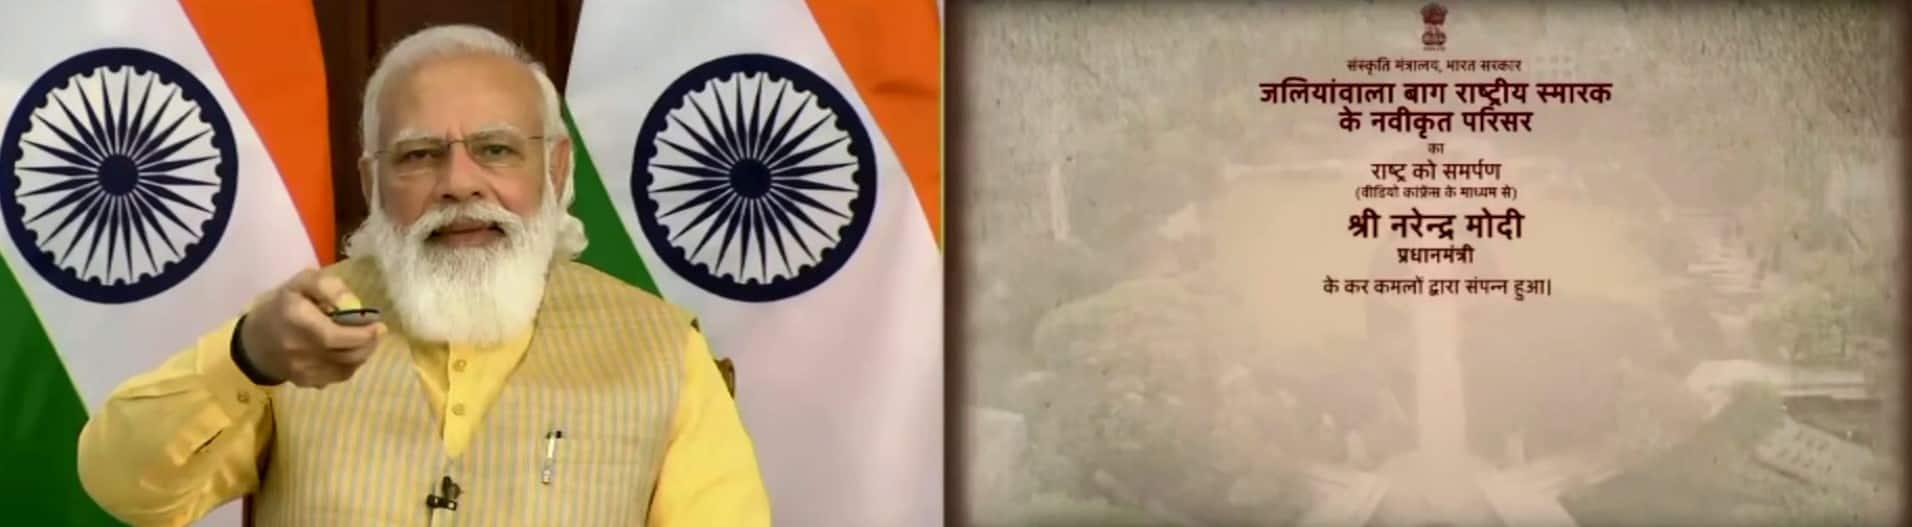 PM Modi inaugurated renovated Jallianwala Bagh memorial complex